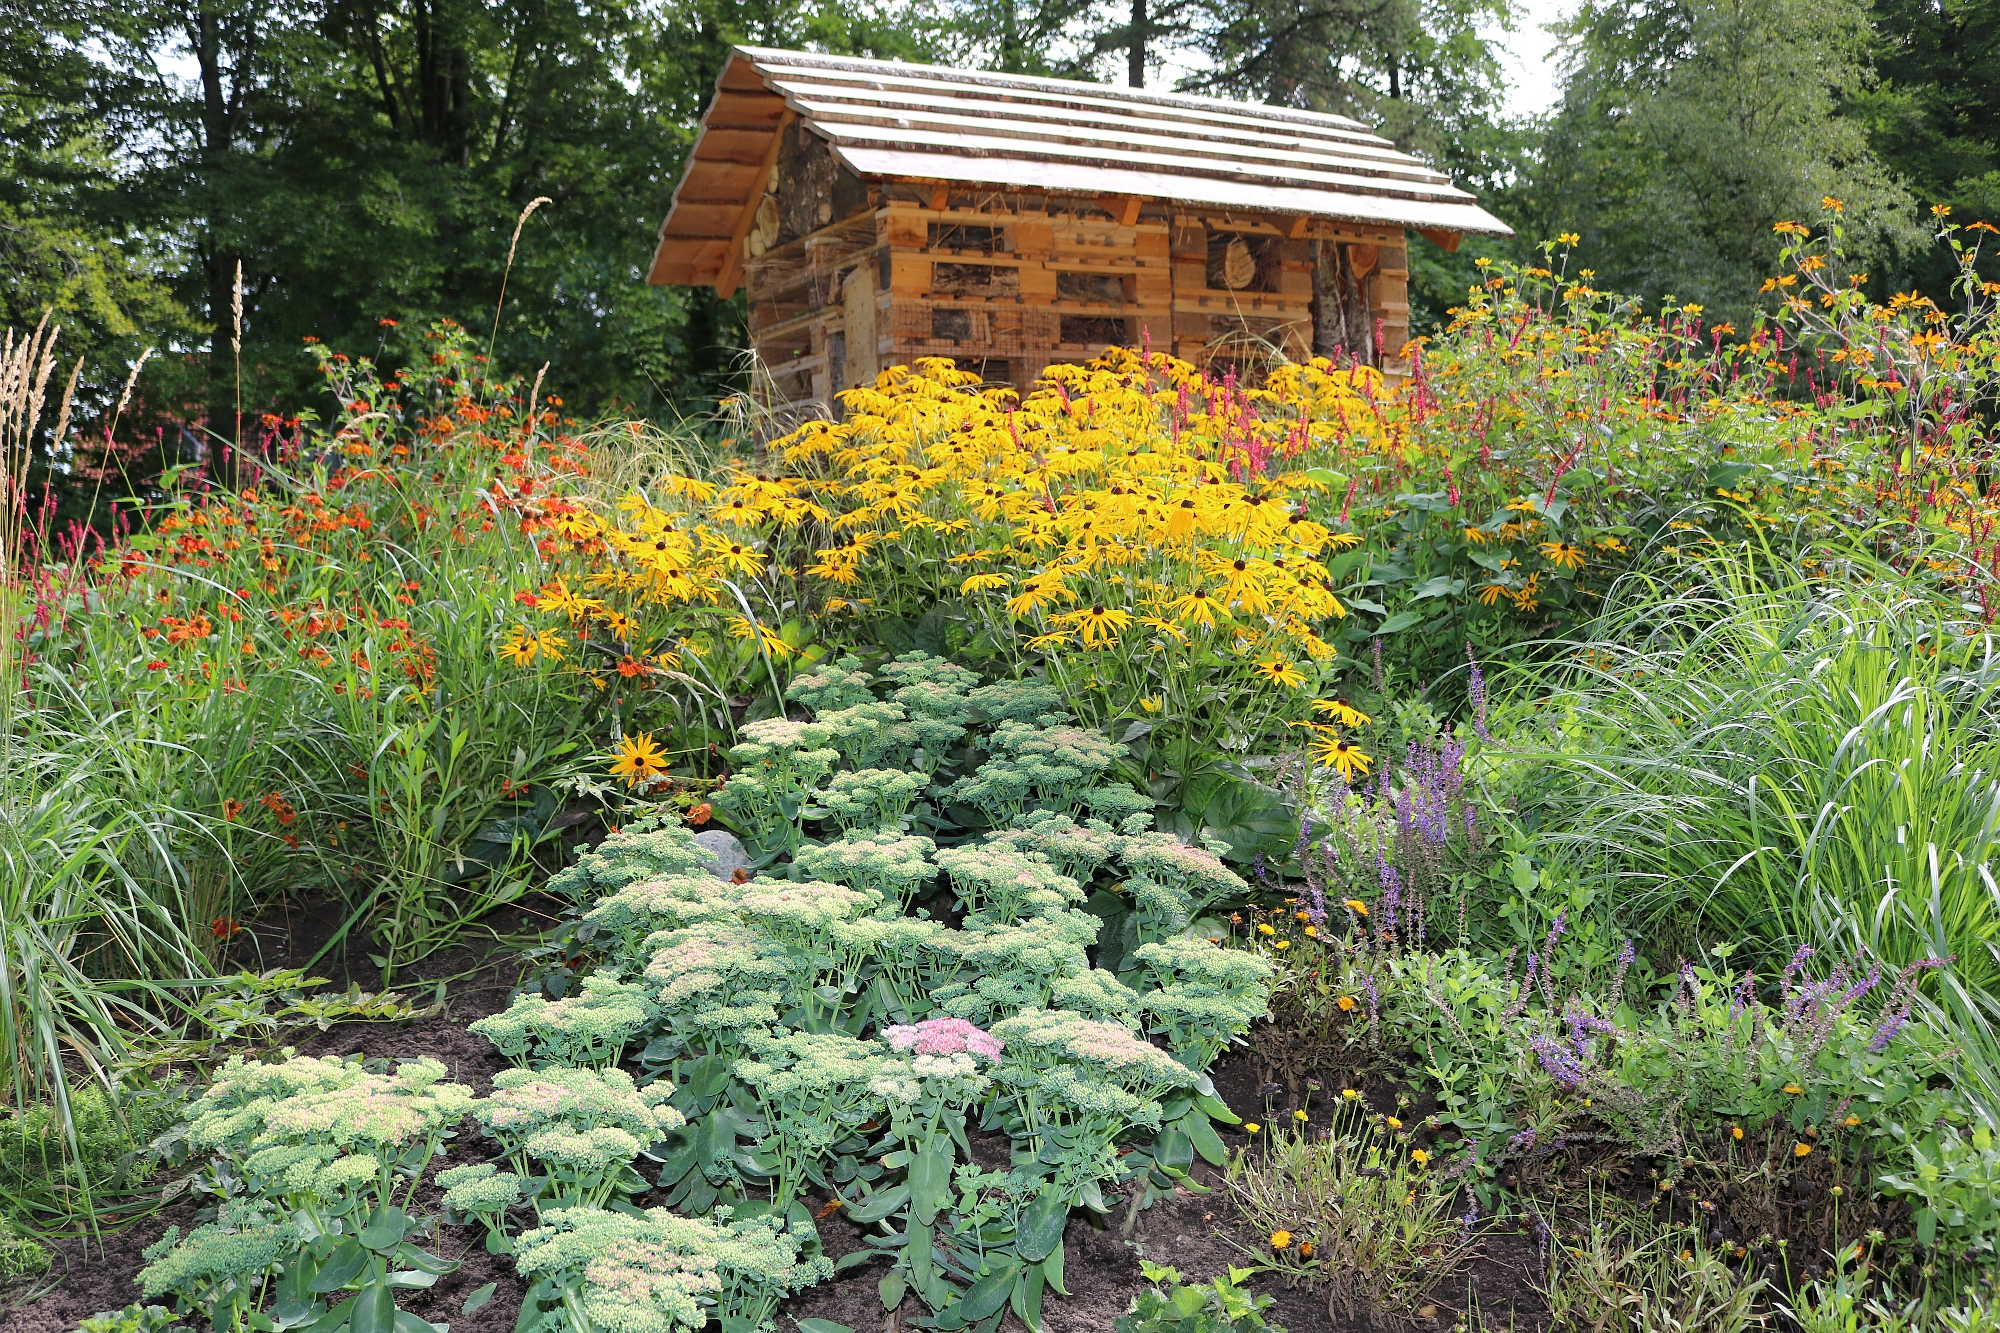 202008 Kaiserhain Insektenhotel 5